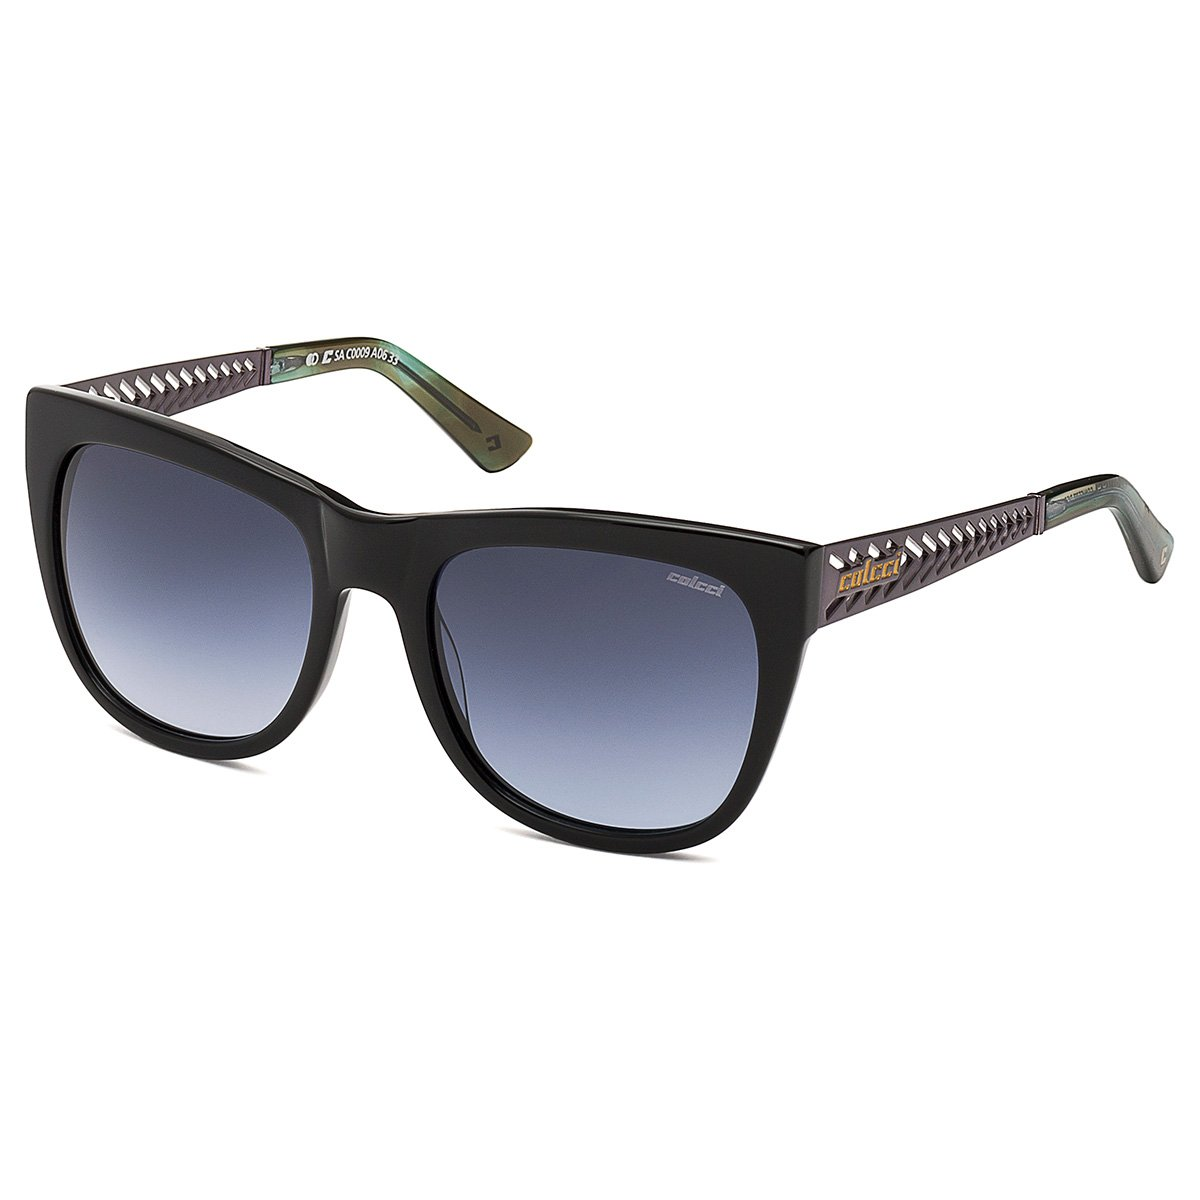 Óculos de Sol Colcci C0009 Feminino - Compre Agora   Zattini d2288713e5